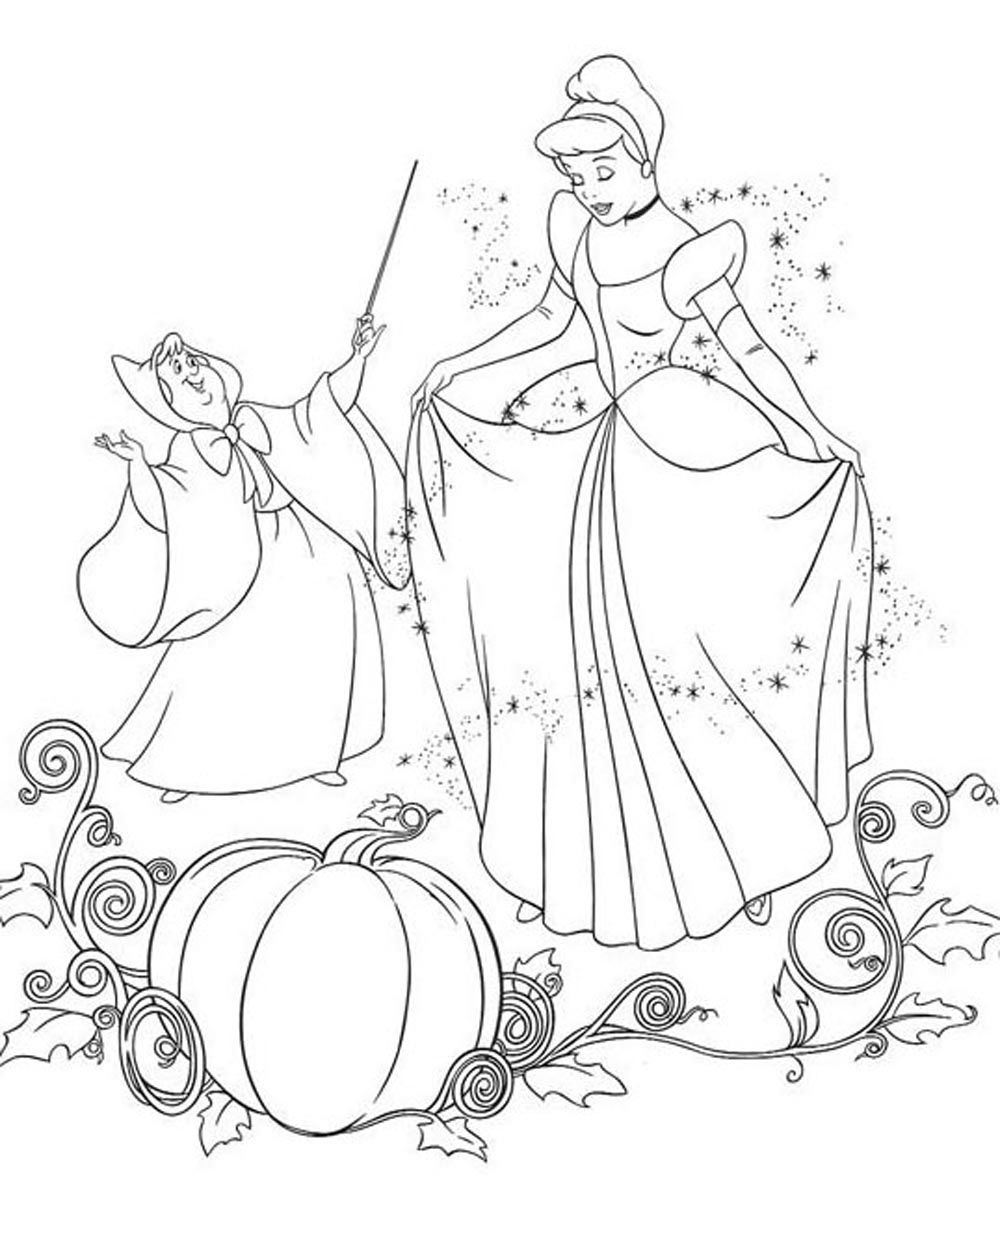 Princess coloring princess cinderella embroidery and coloring book